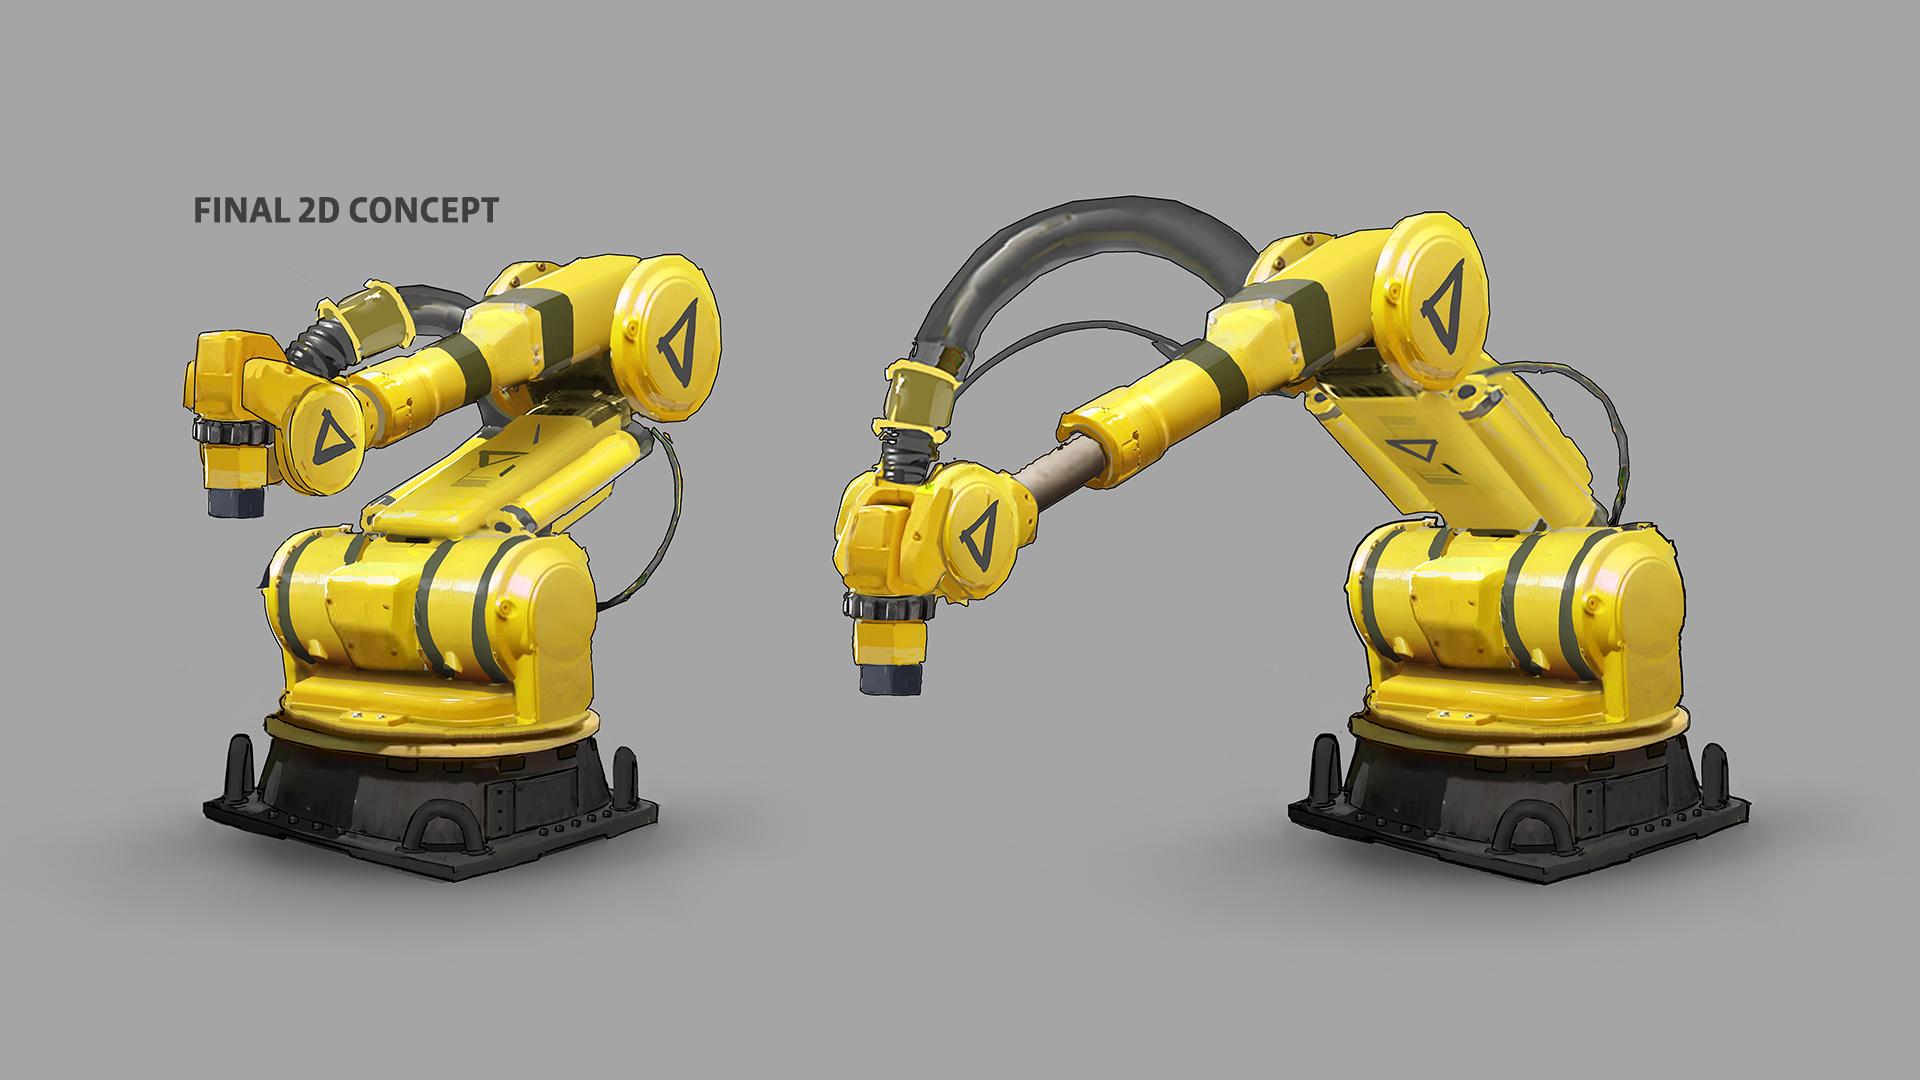 04_FordPrinter_final_concept.jpg